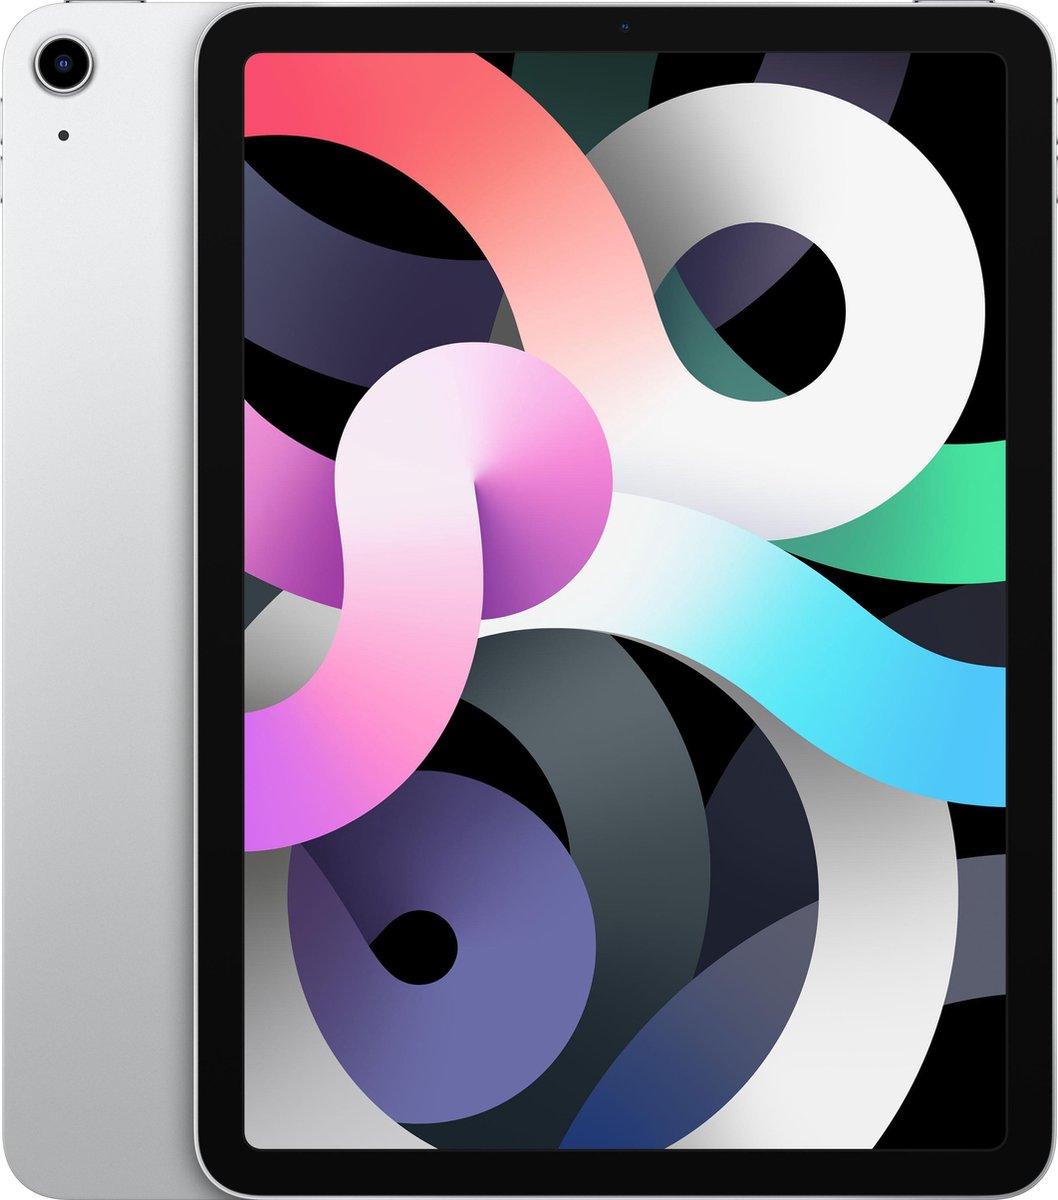 Apple iPad Air (2020) - 10.9 inch - WiFi - 256GB - Zilver